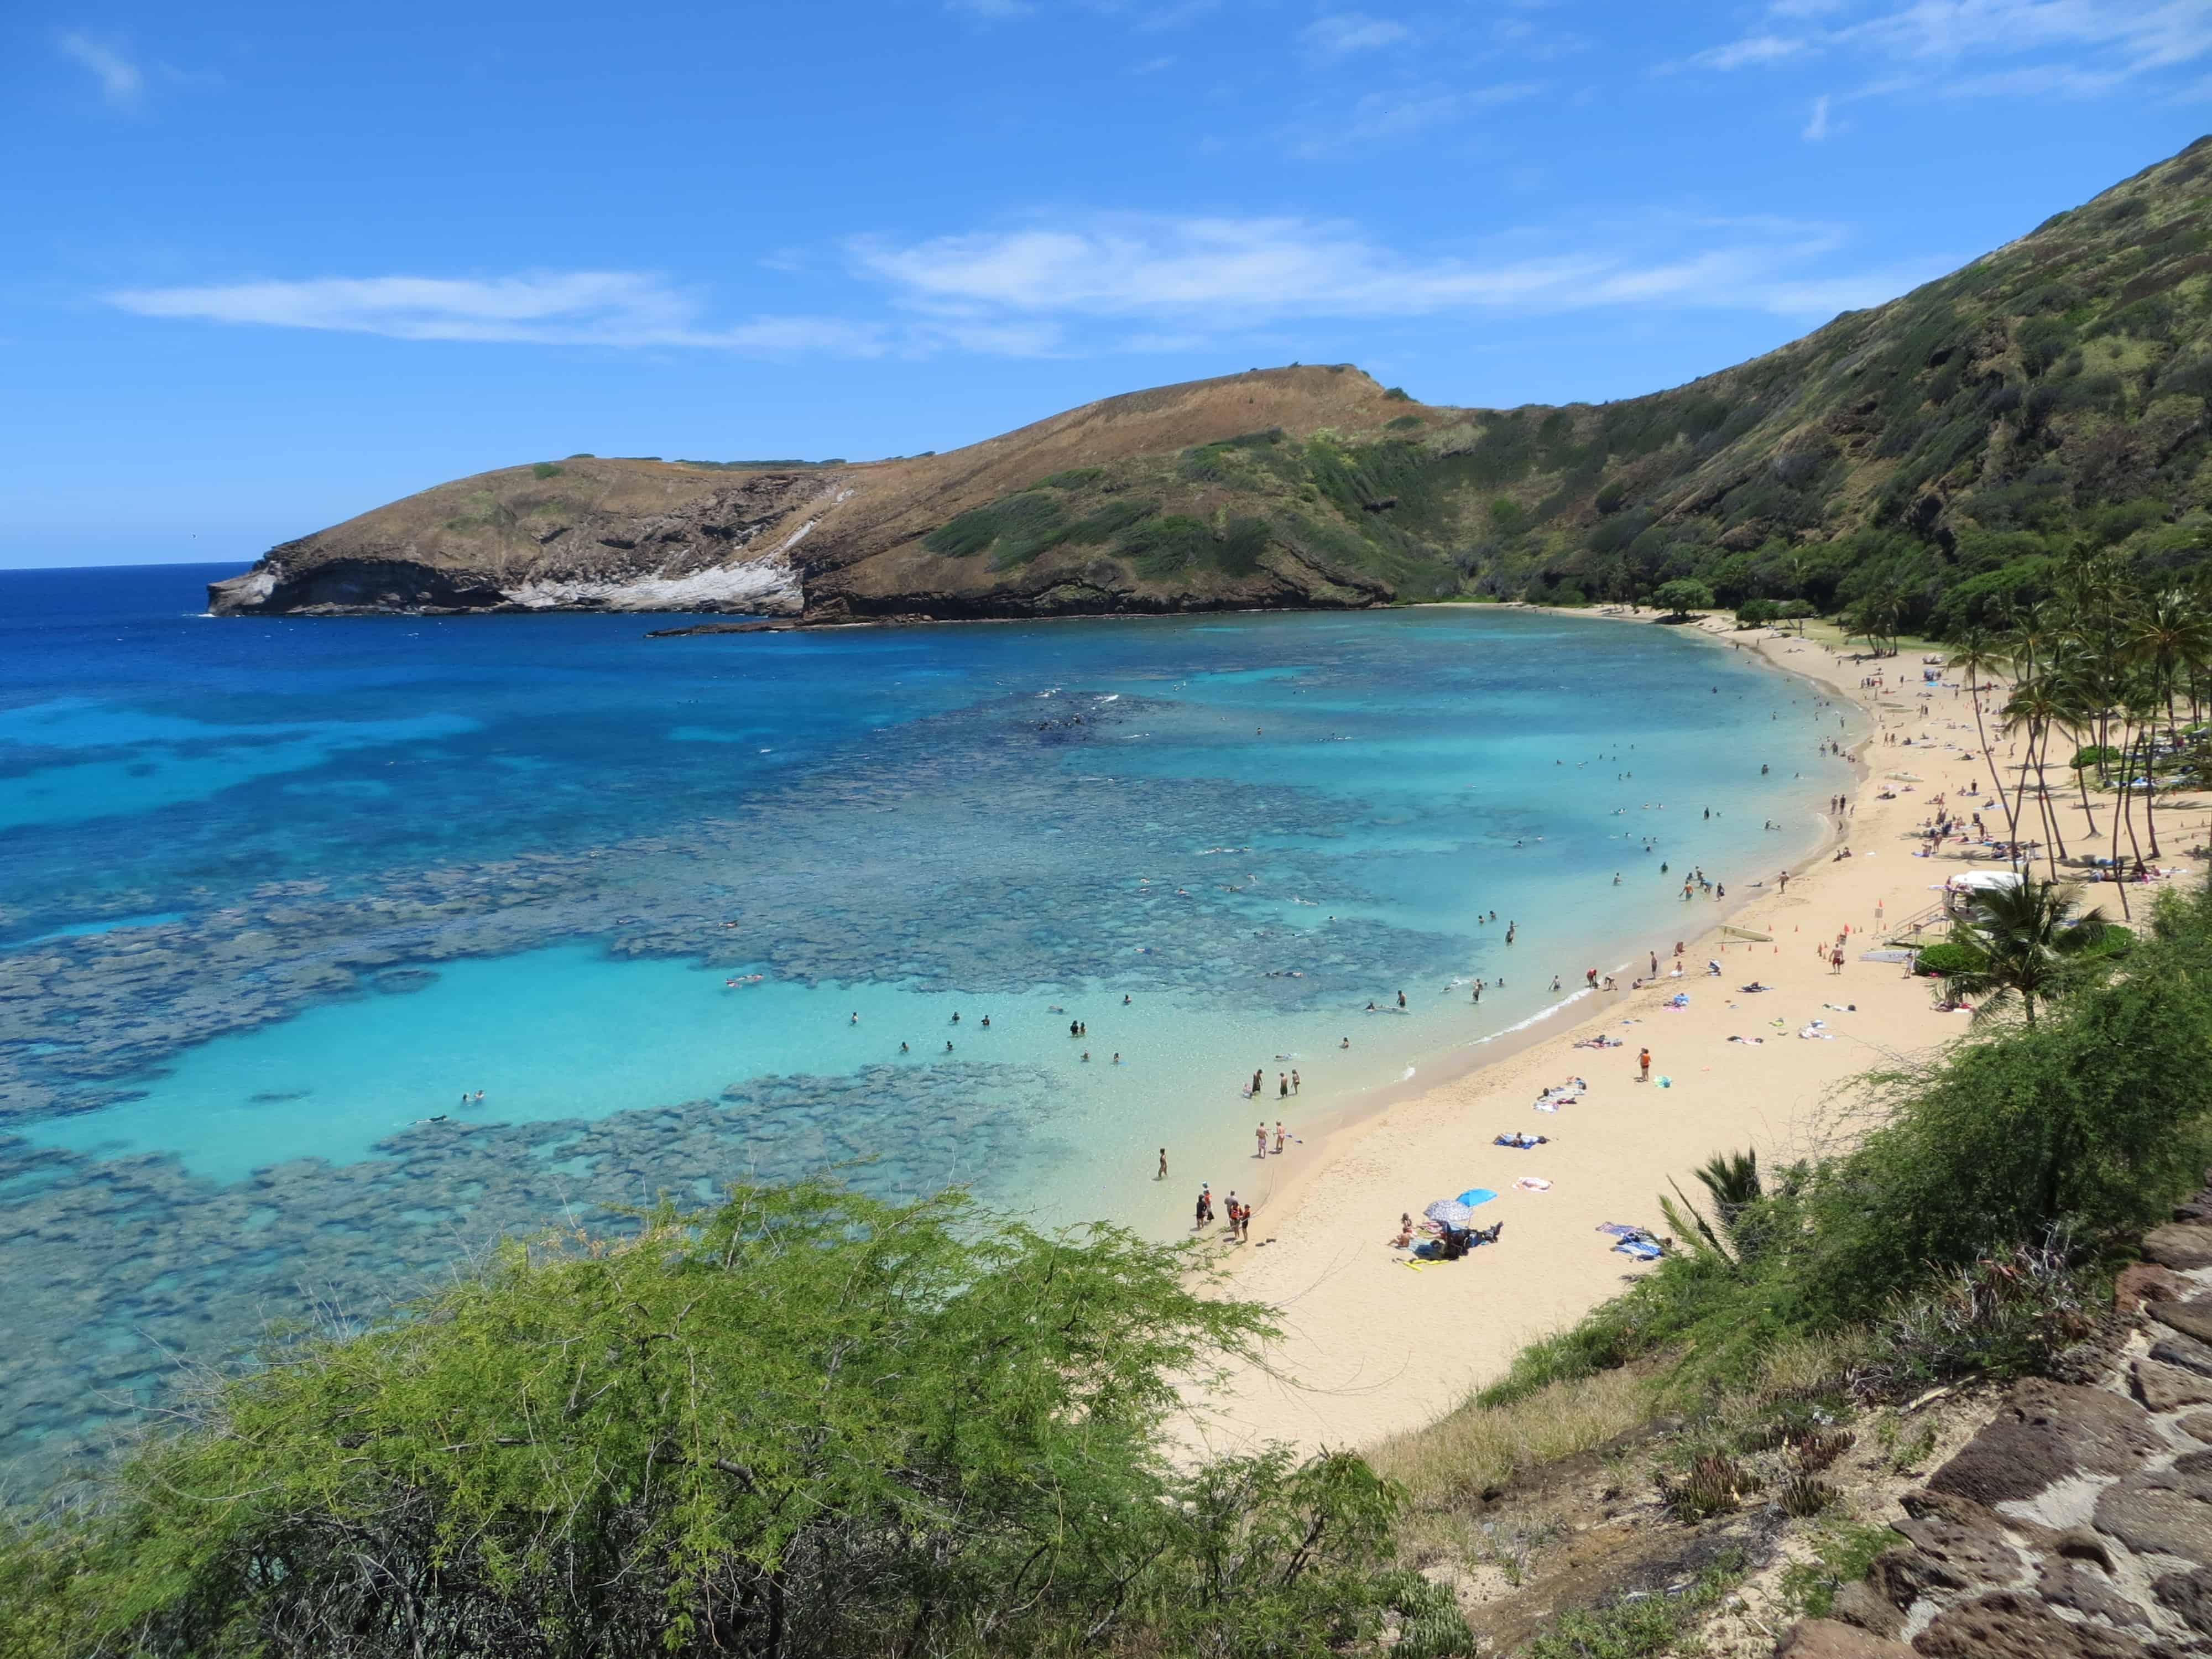 00_Hanauma-Bay-Oahu-Hawaii